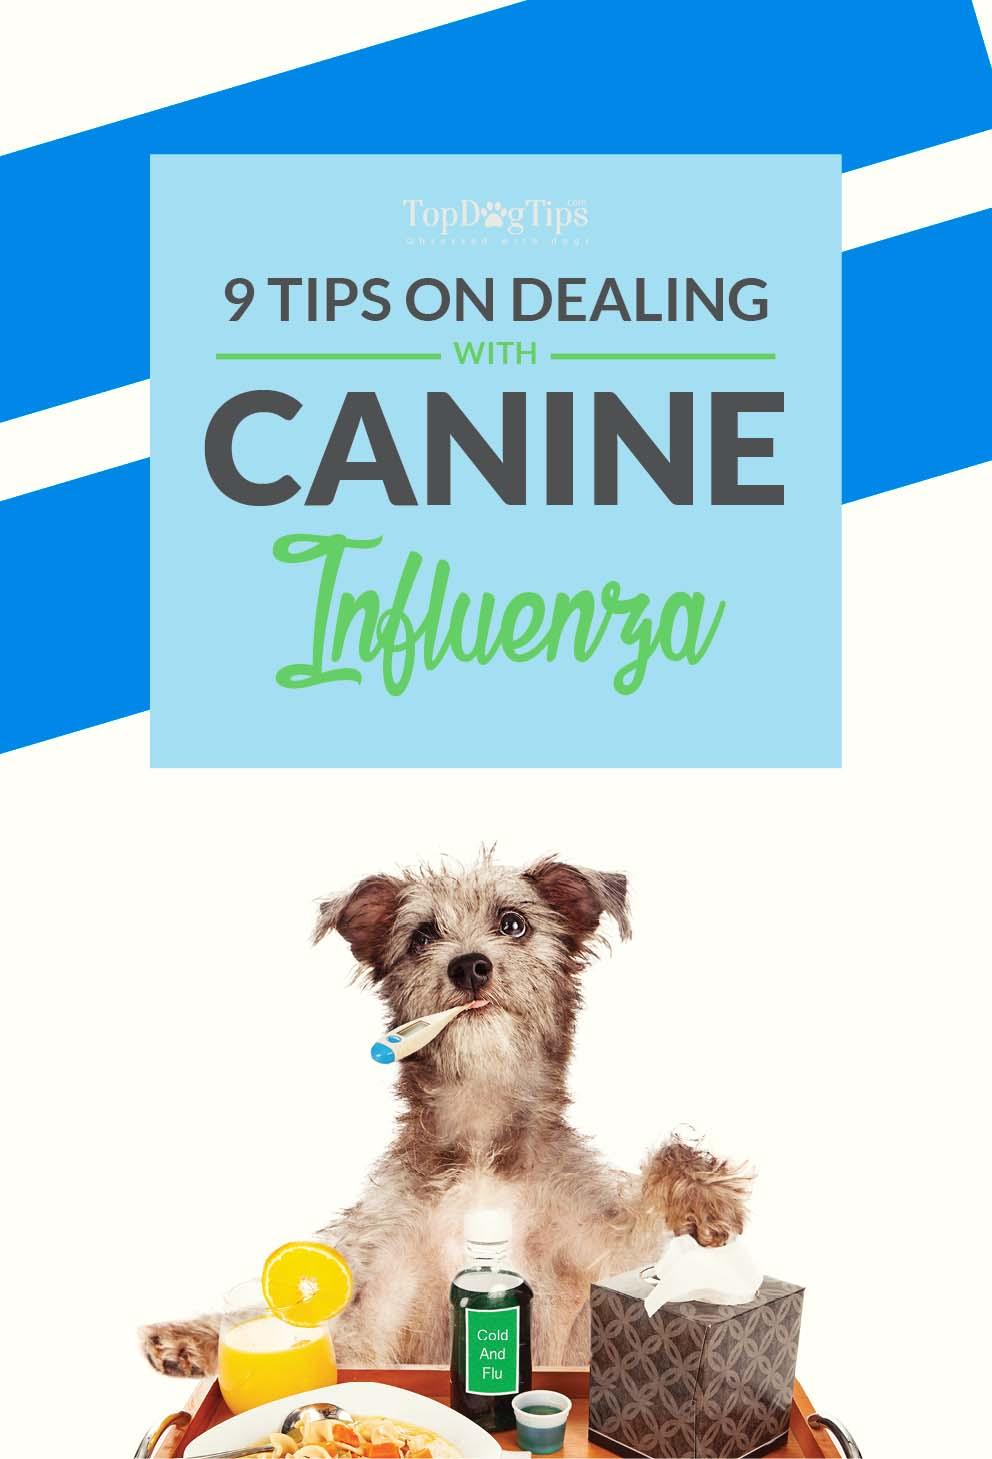 Canine Influenza Advice